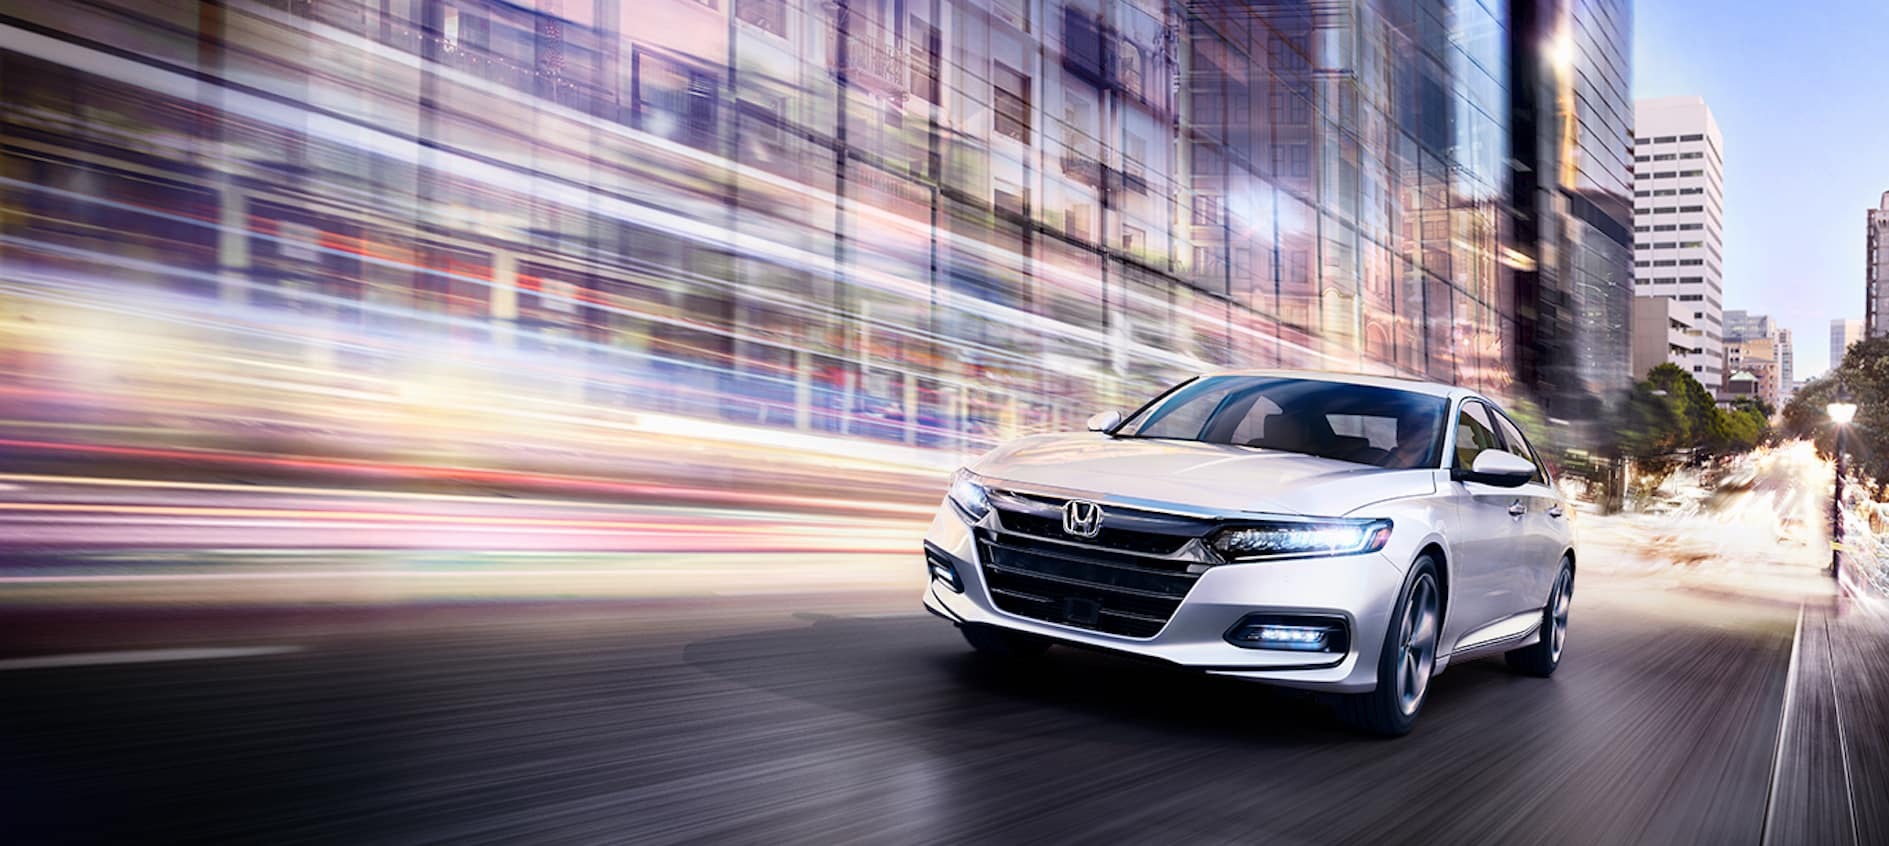 2019 Honda Accord Front Exterior